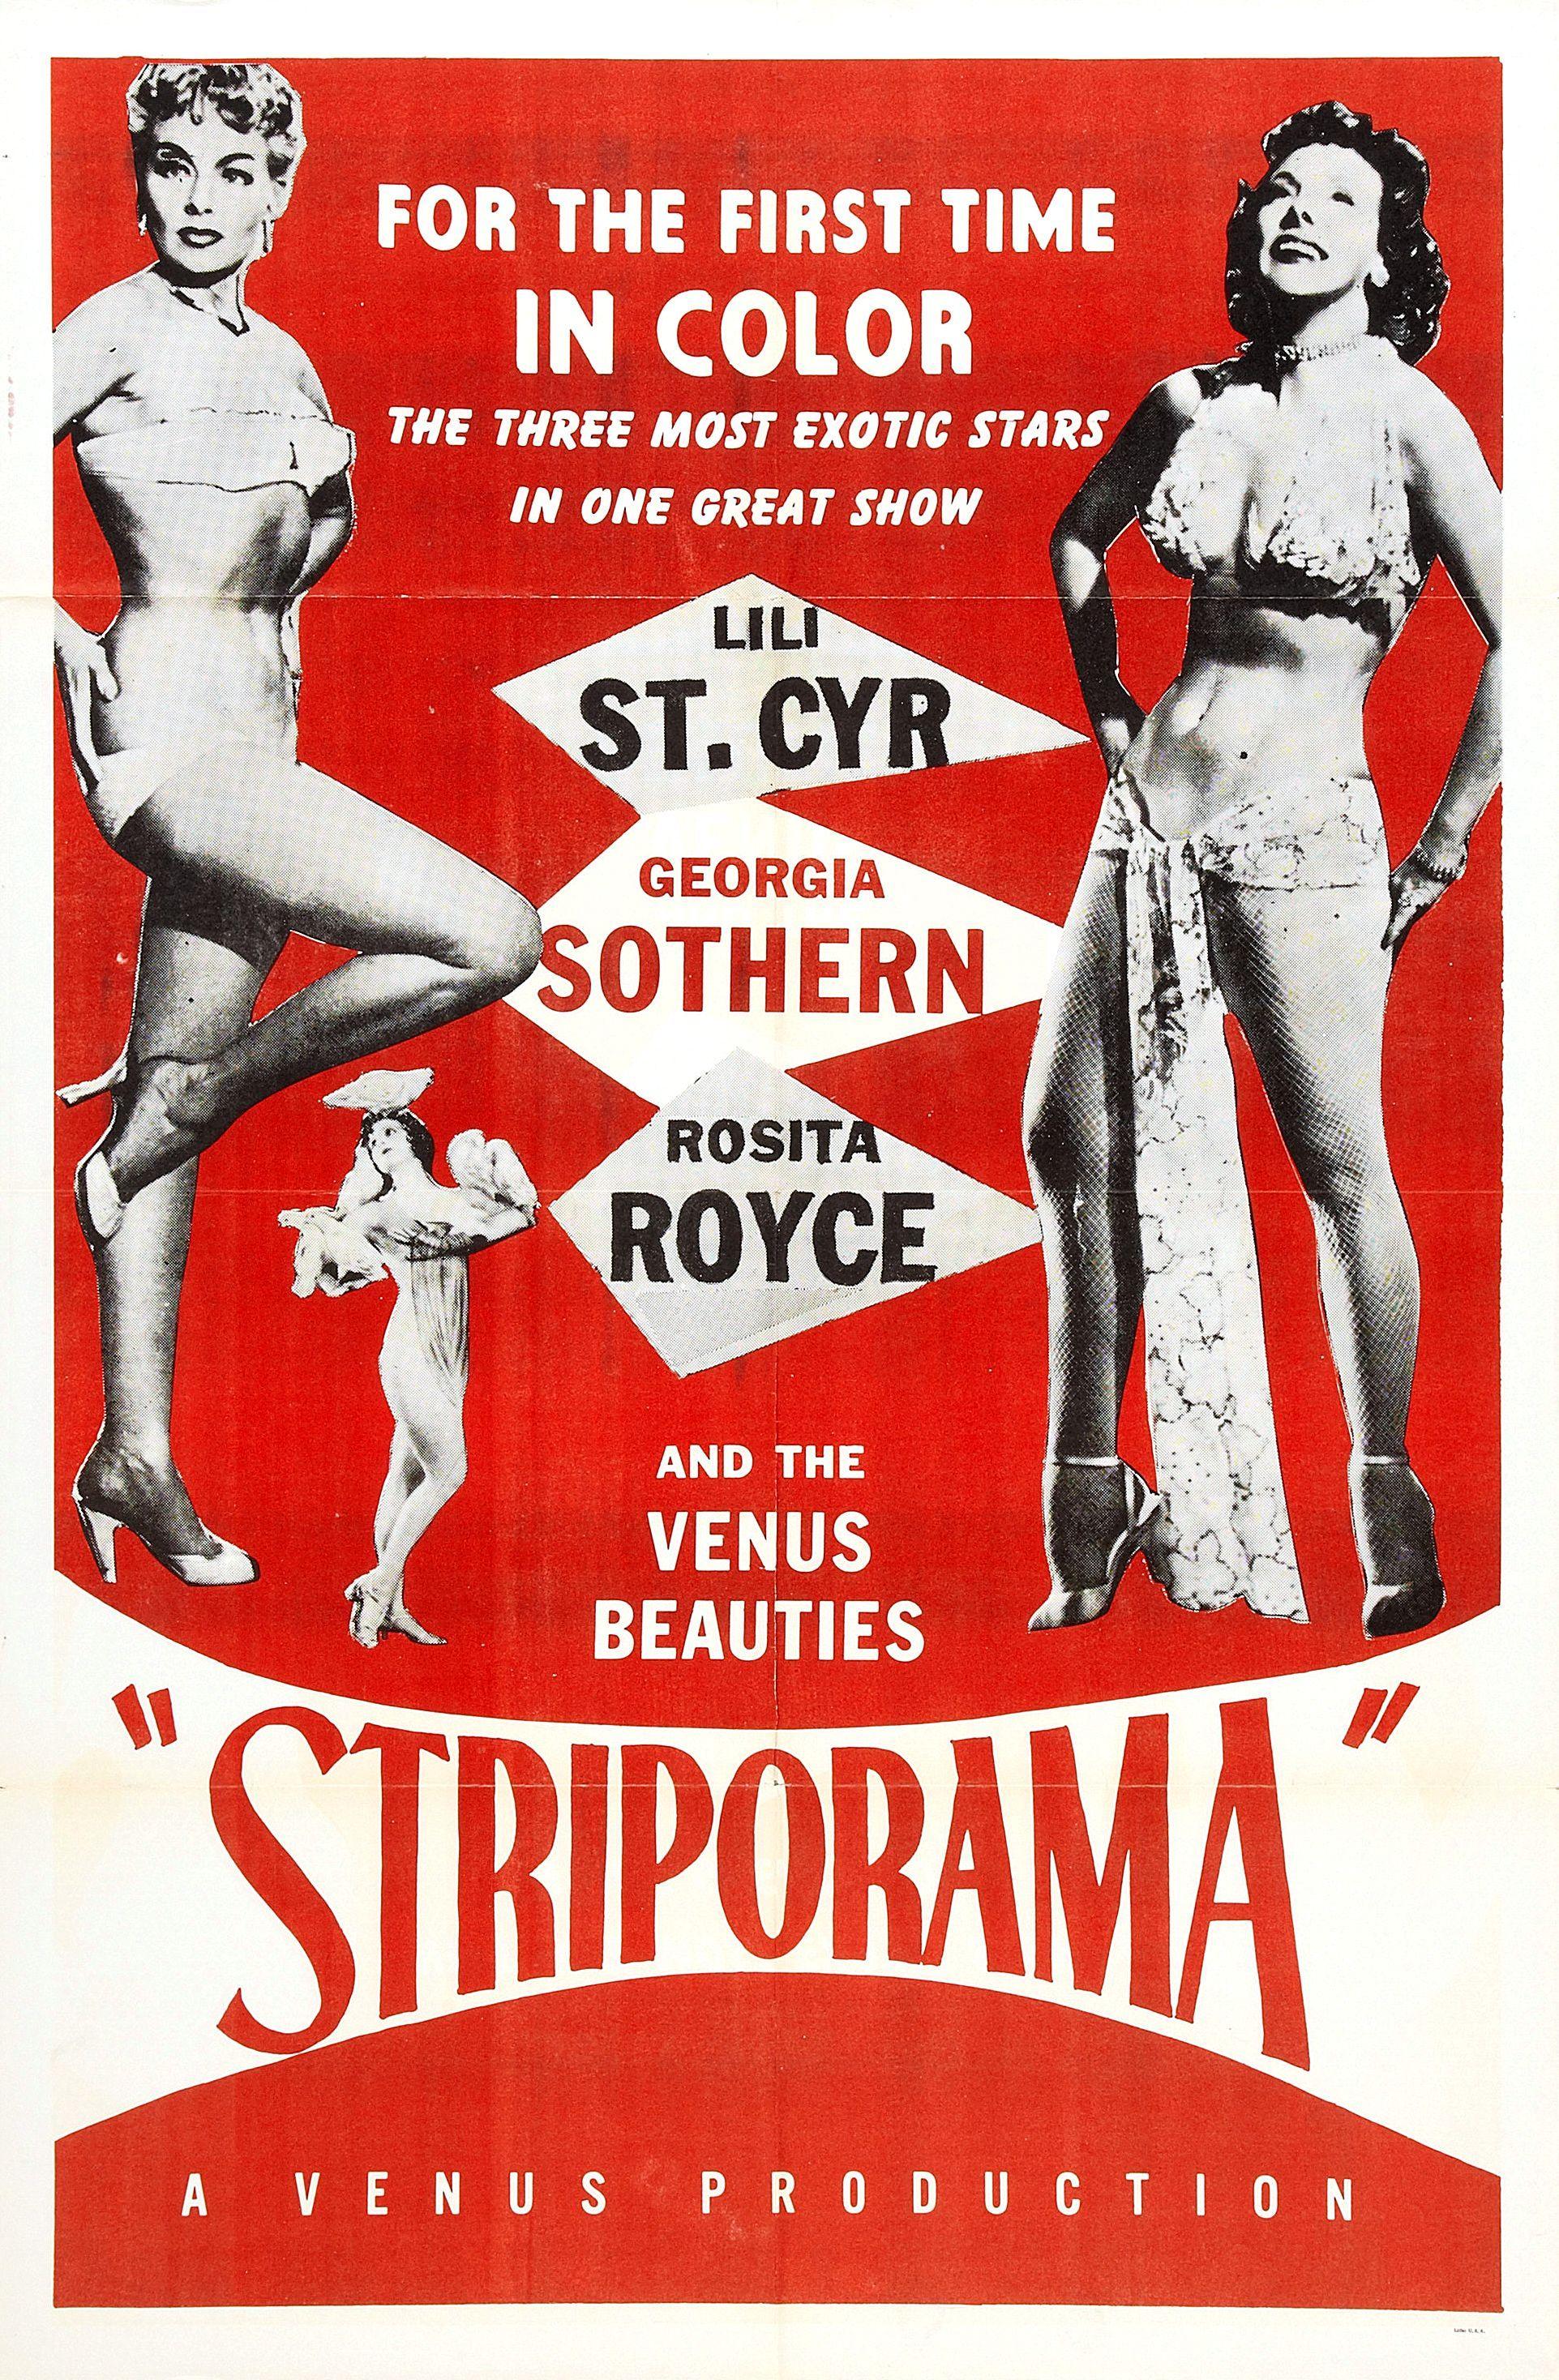 Poster design 1950 - Vintage Burlesque Poster Striporama Reprint By Vintagepinupdreams